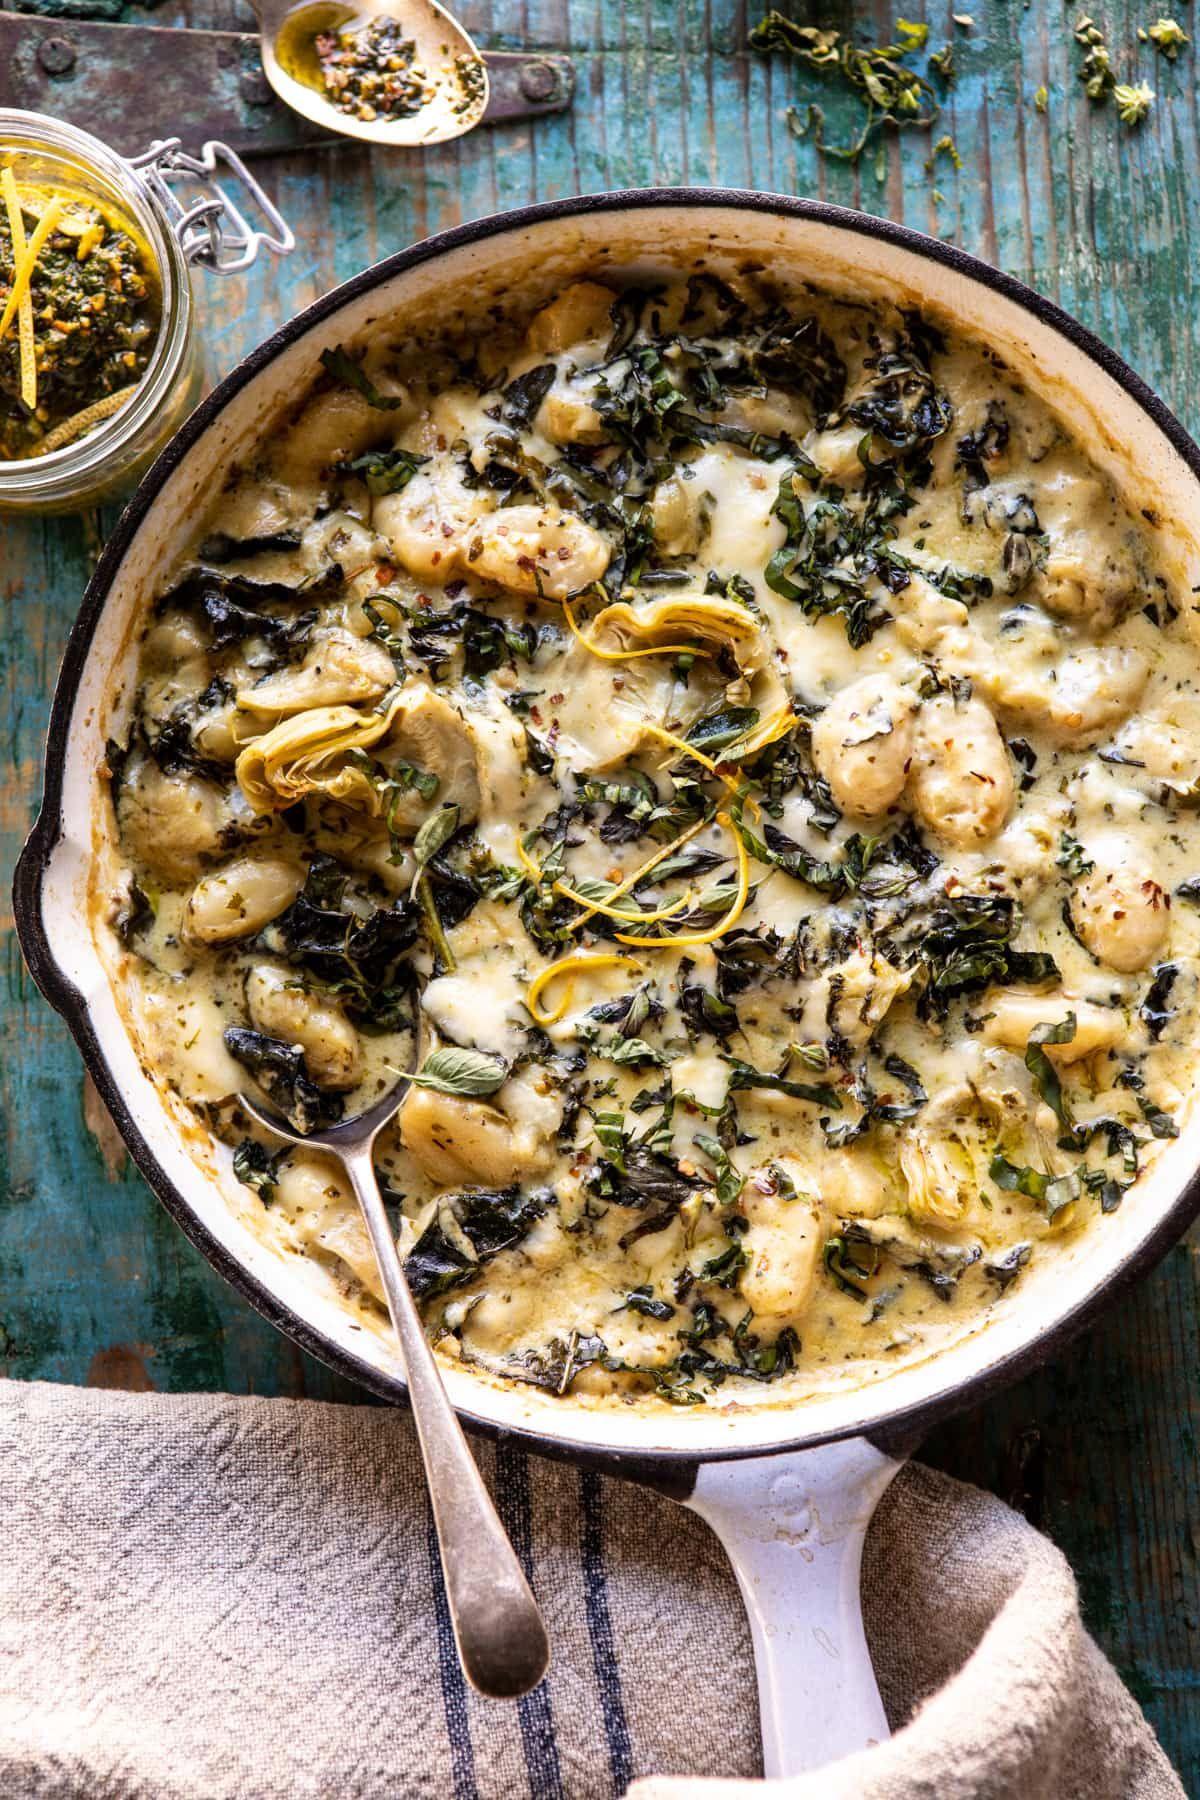 Skillet Baked Creamy Peston Spinach and Artichoke Gnocchi